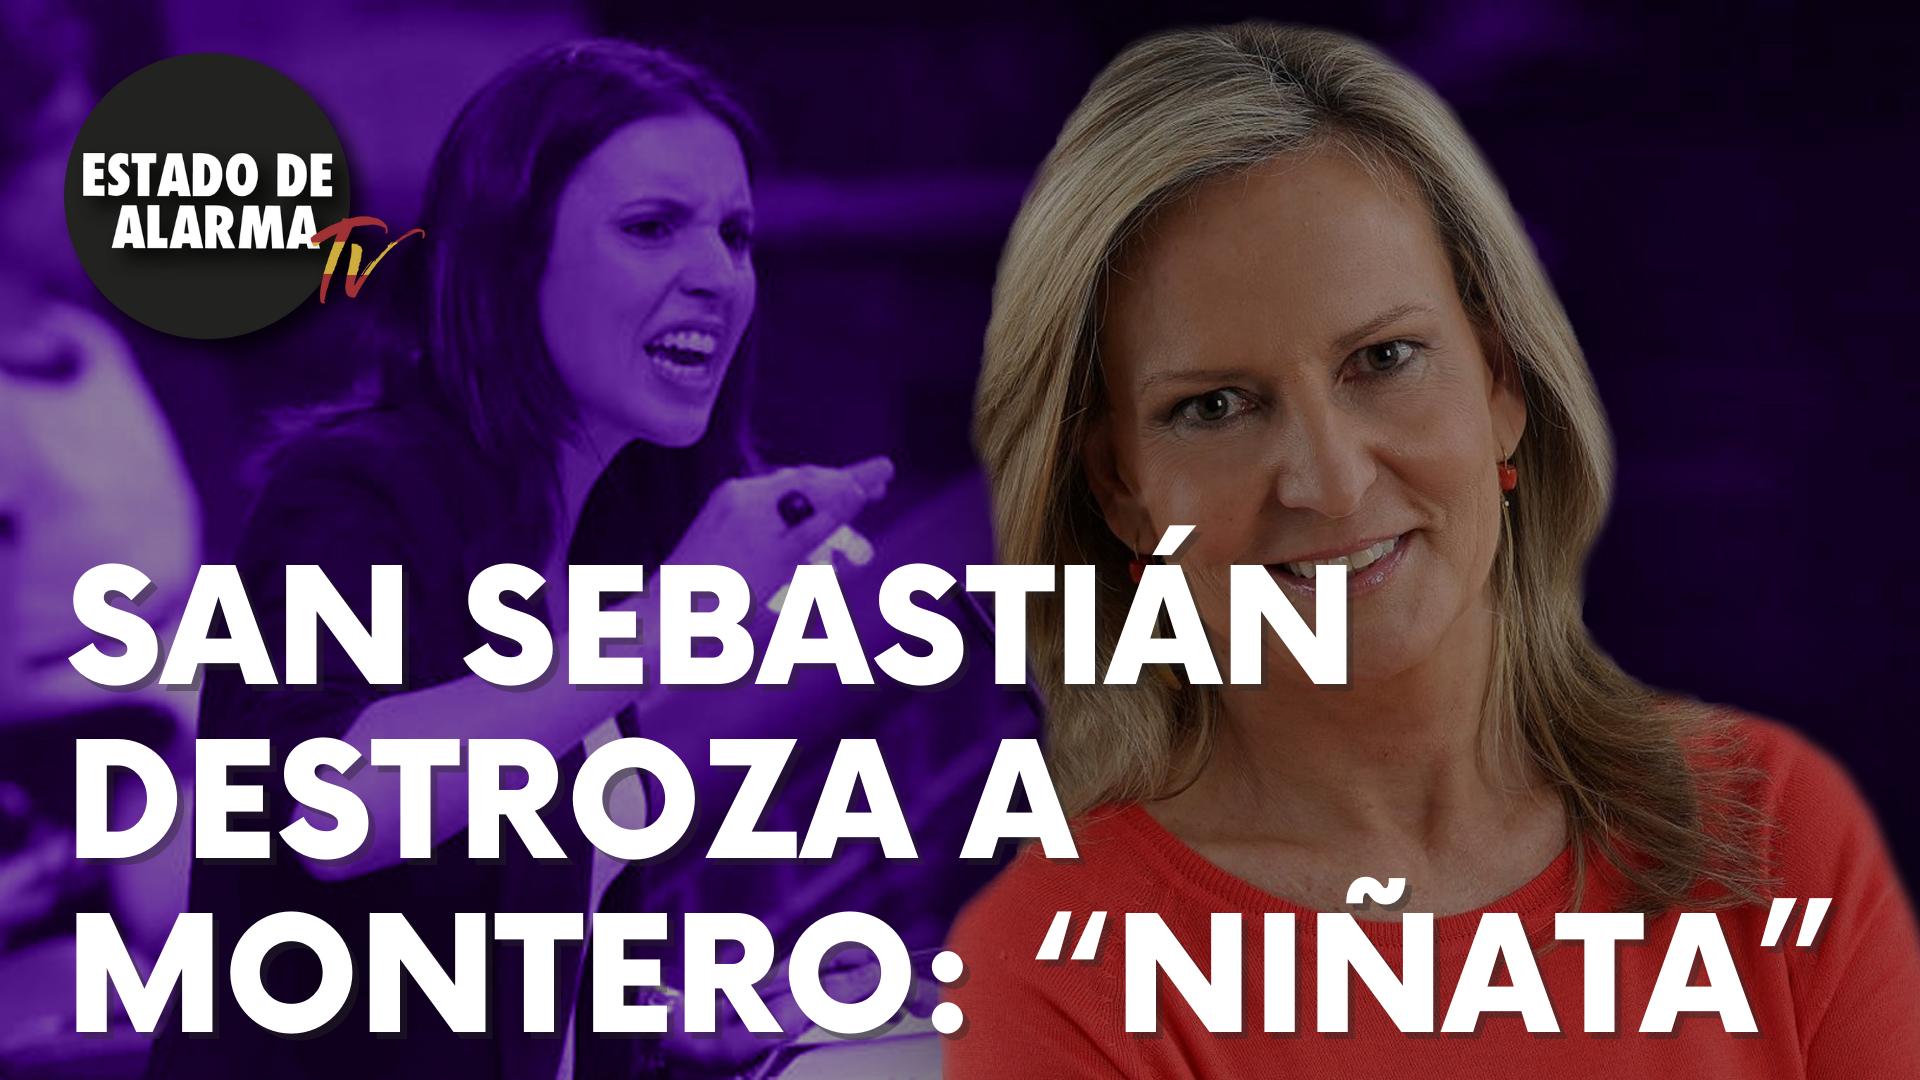 "Isabel San Sebastián destroza a Montero: ""Niñata"""